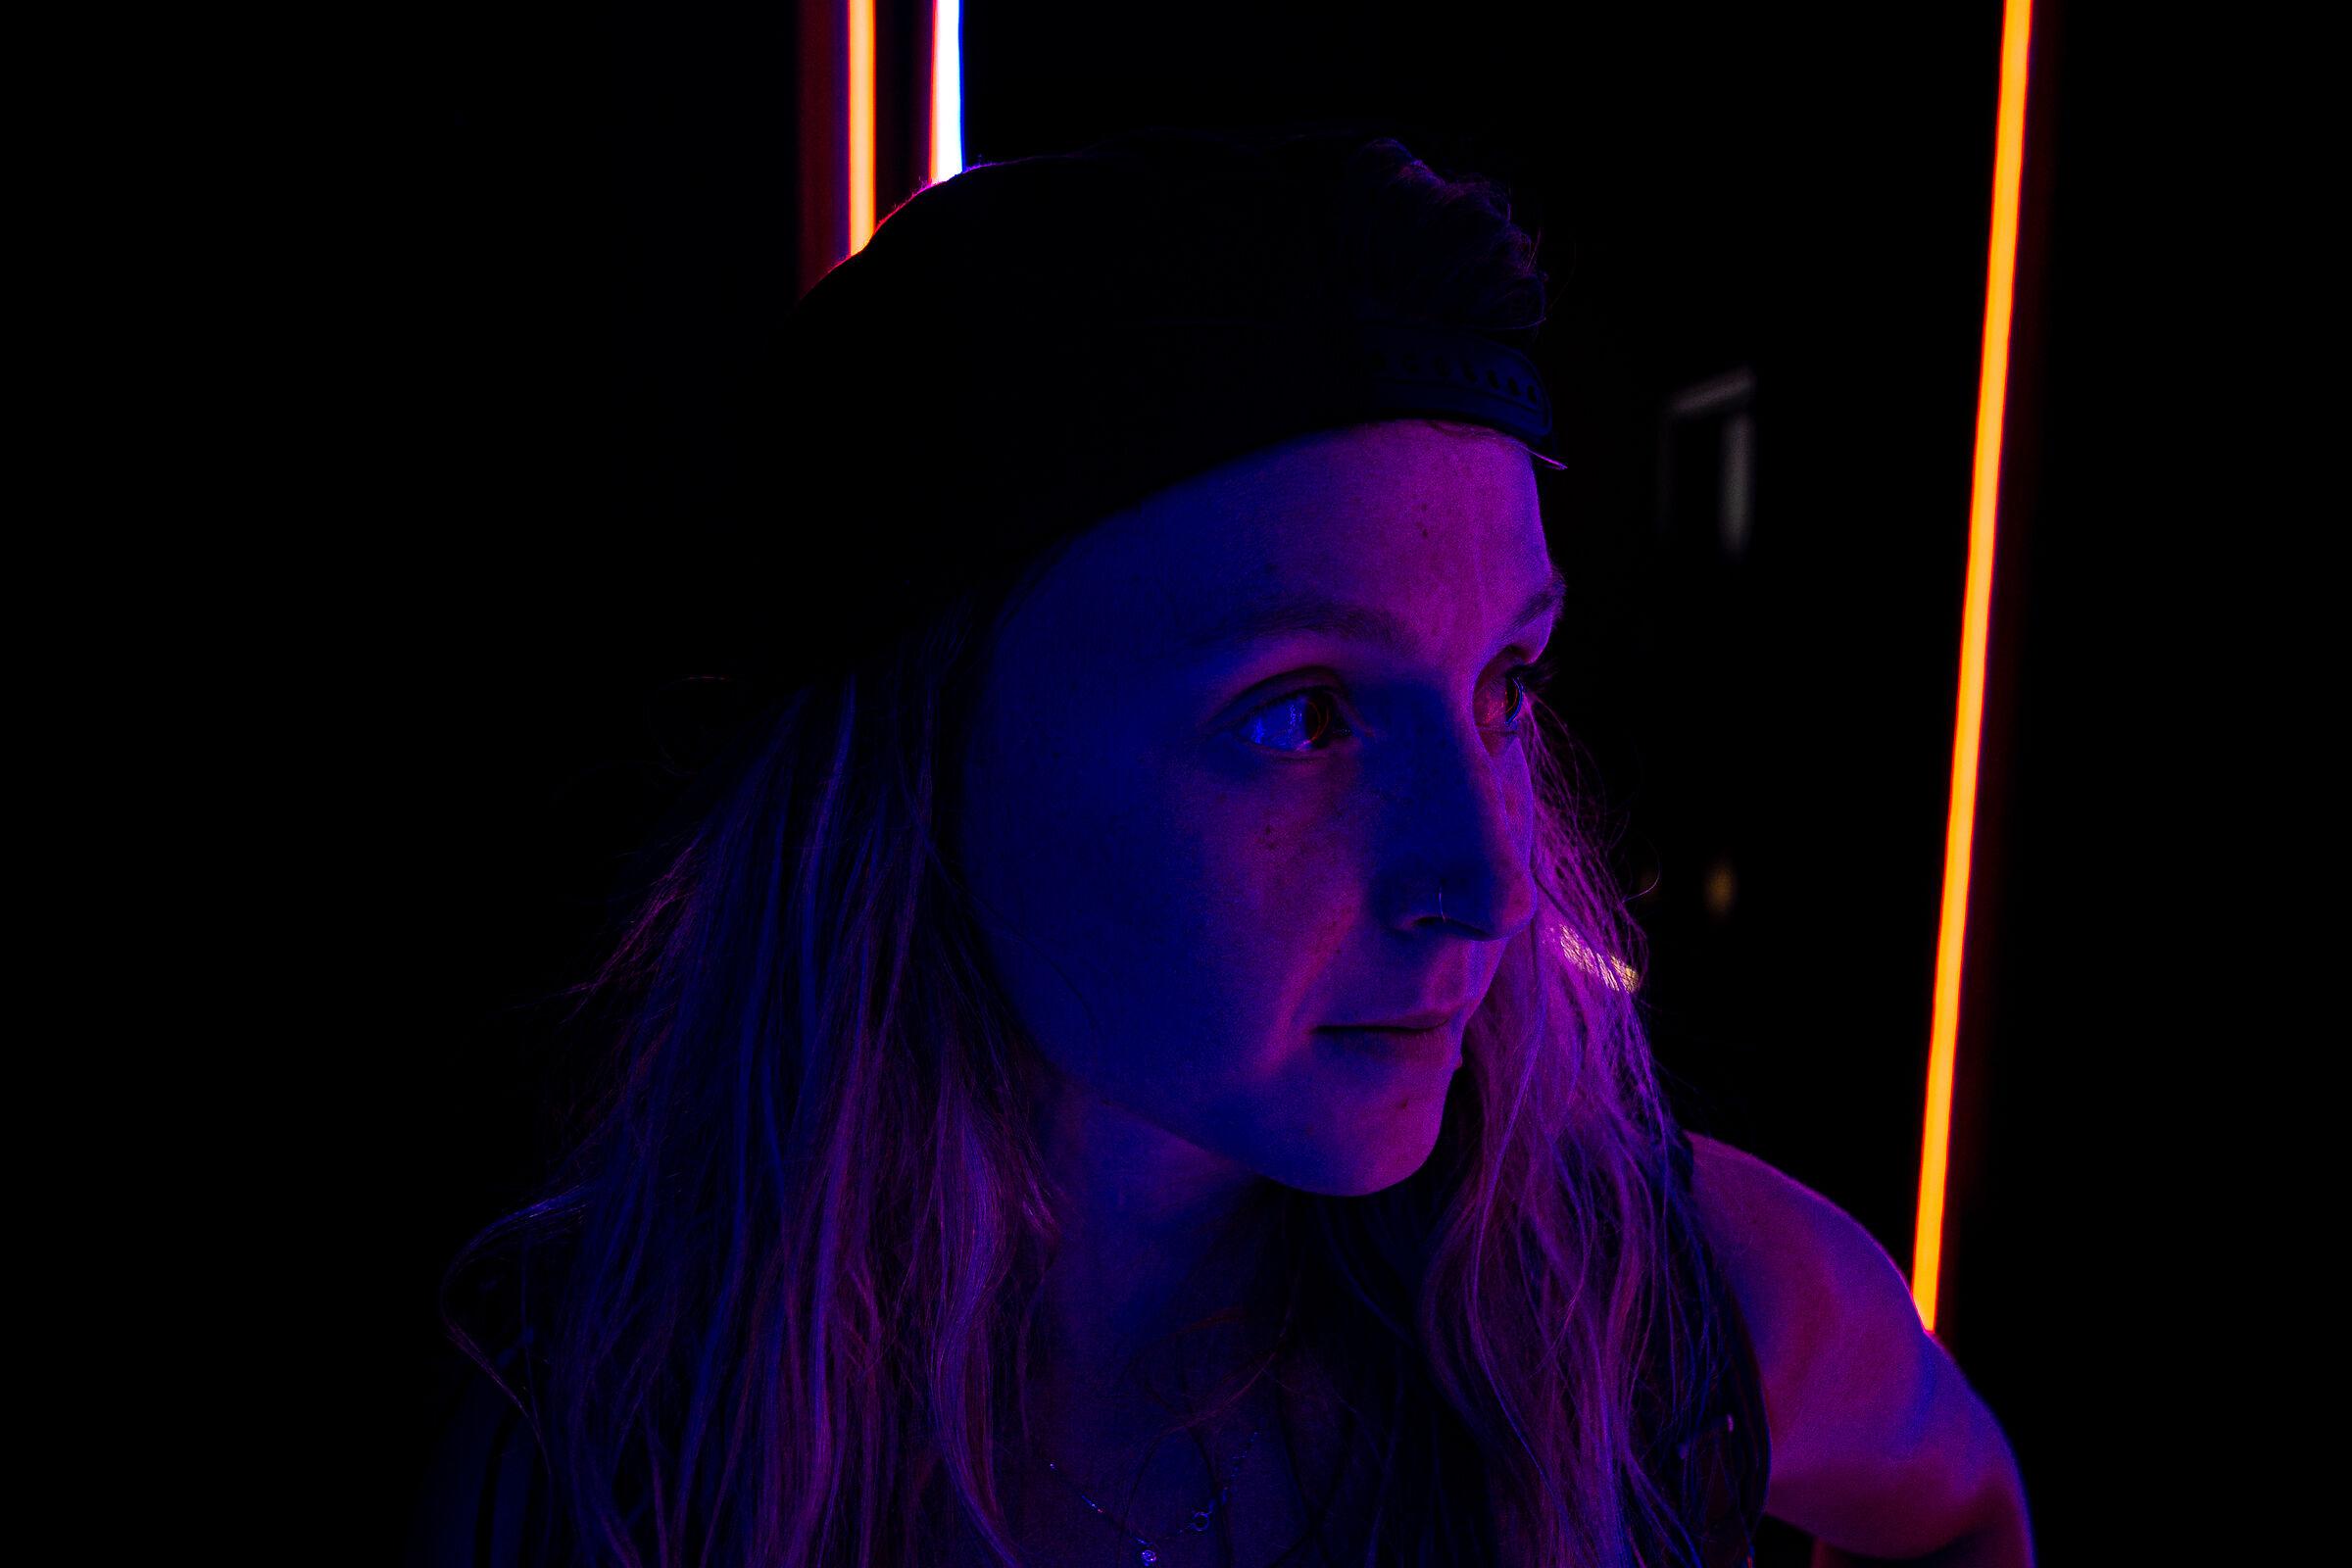 Neon 24h...